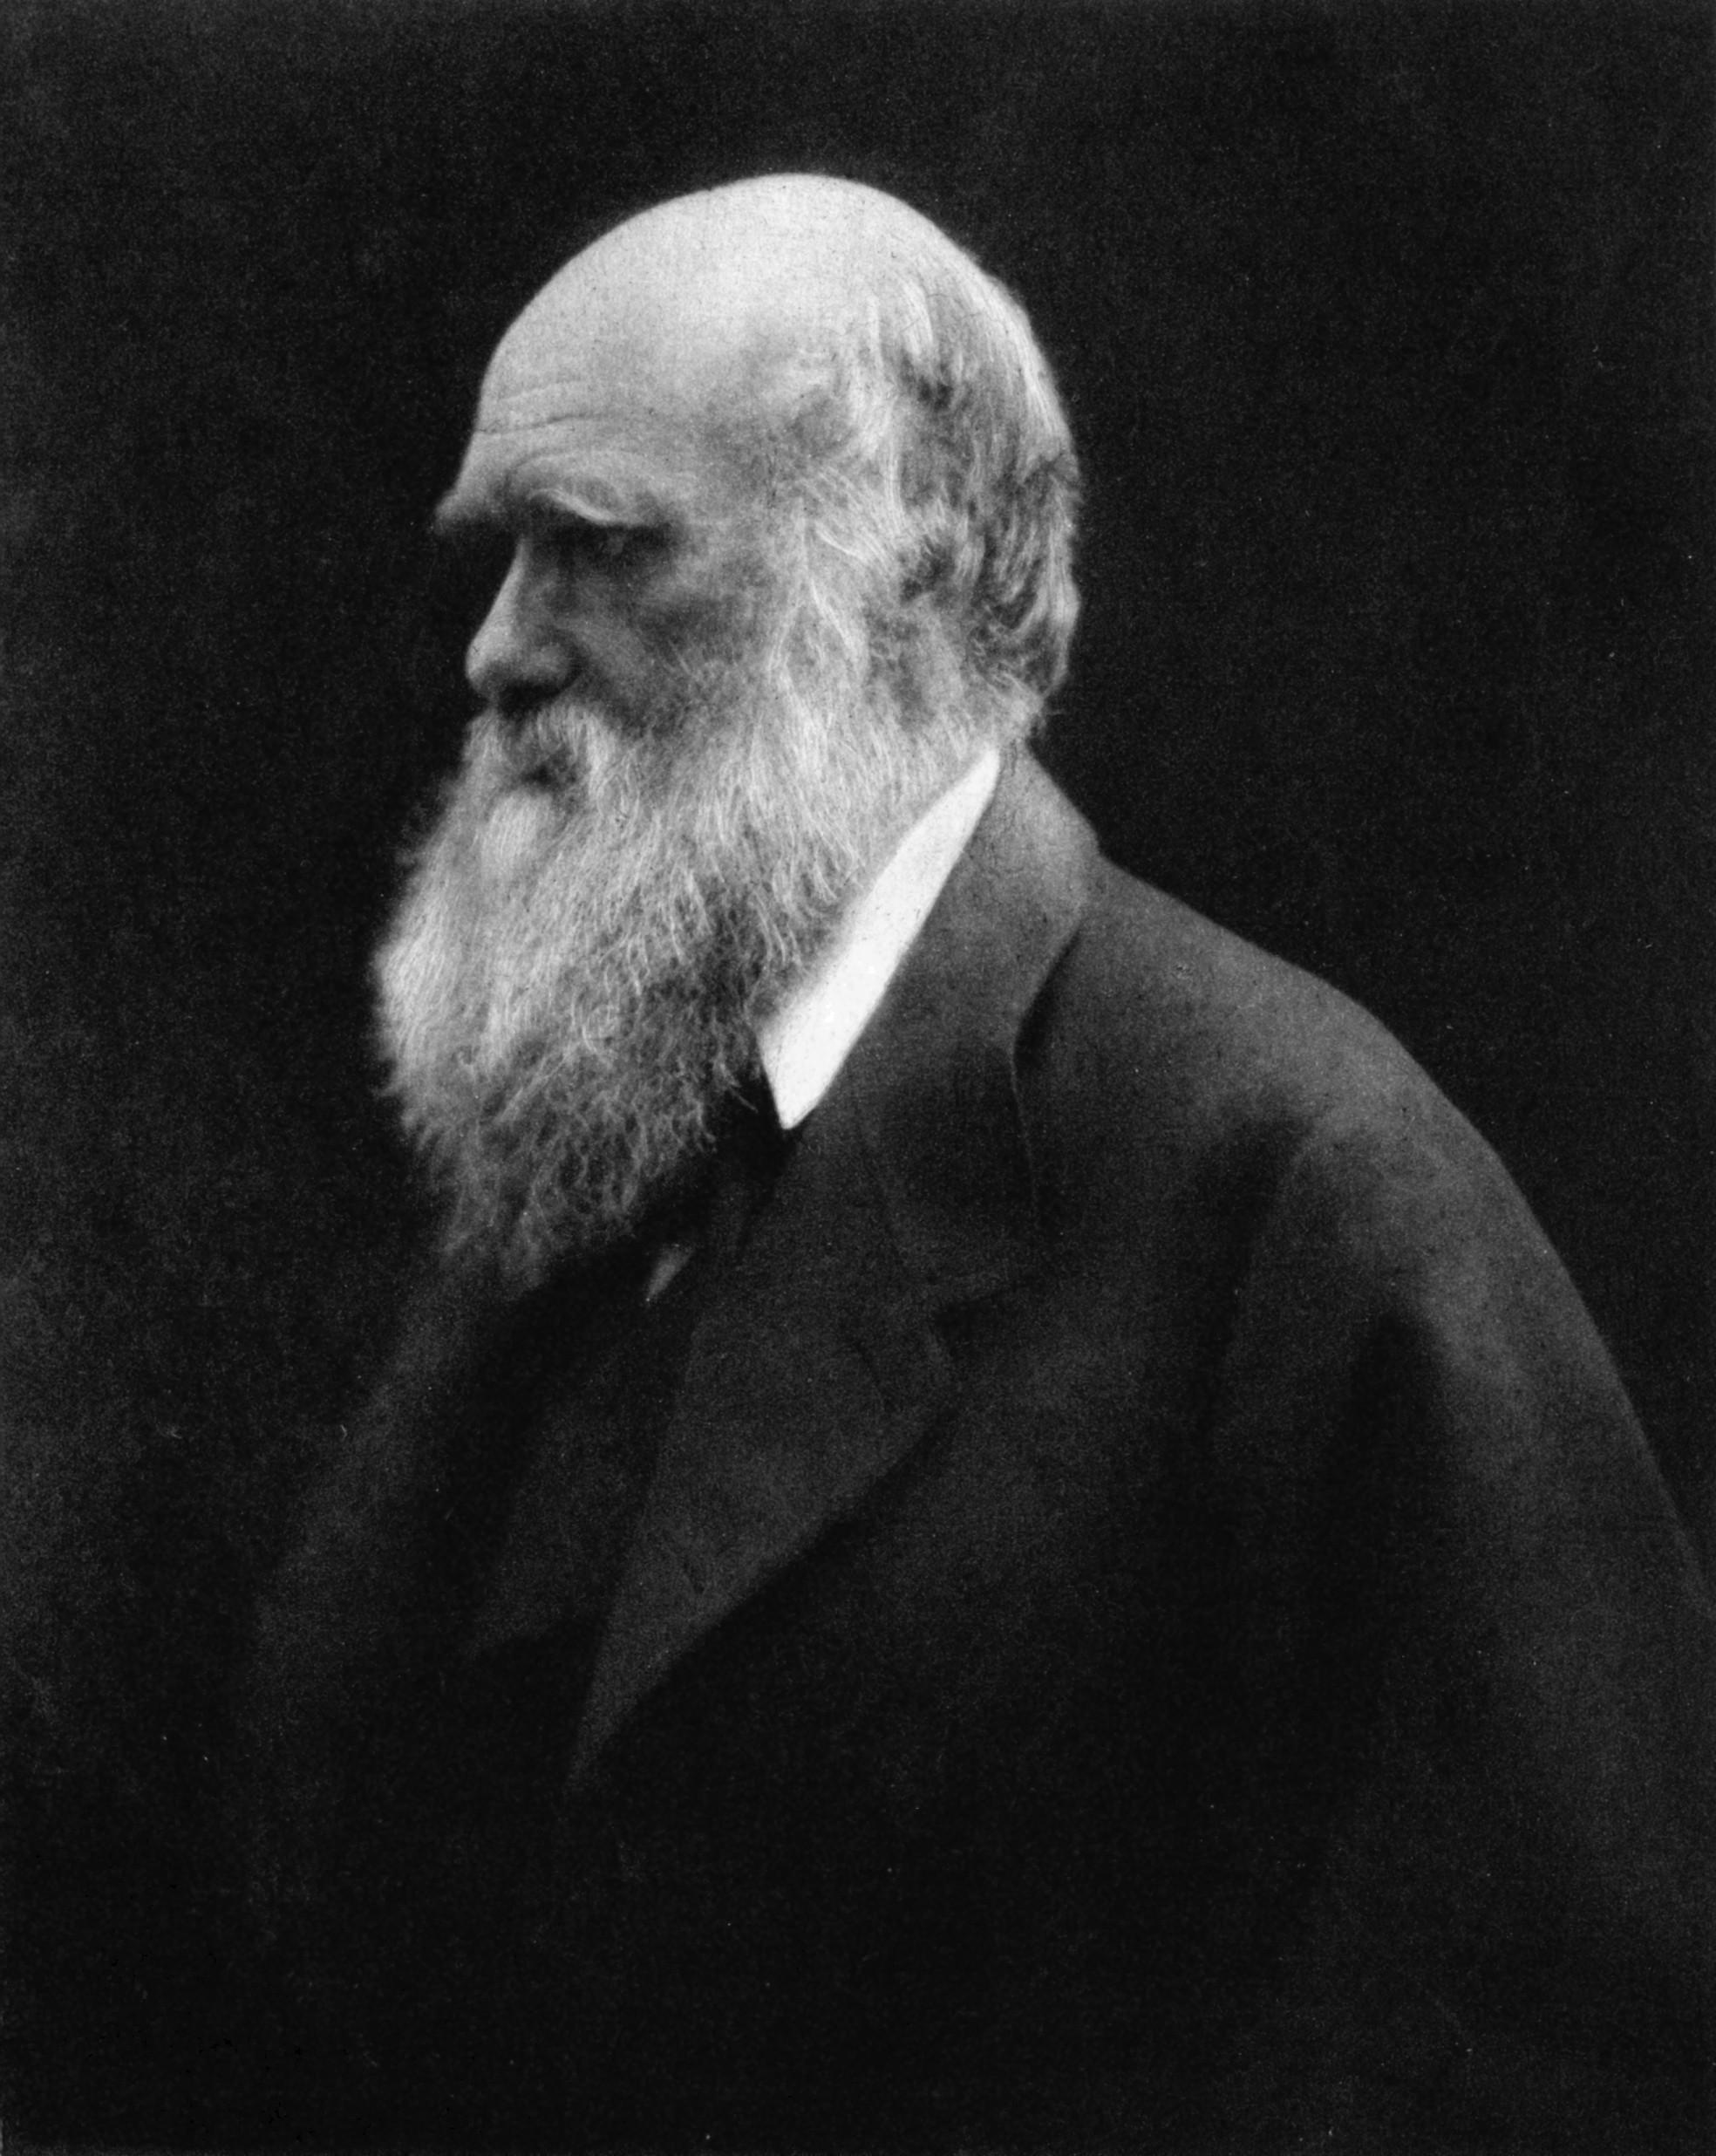 Charles Darwin em 1868 (Foto: Wikimedia/Julia Margaret Cameron)